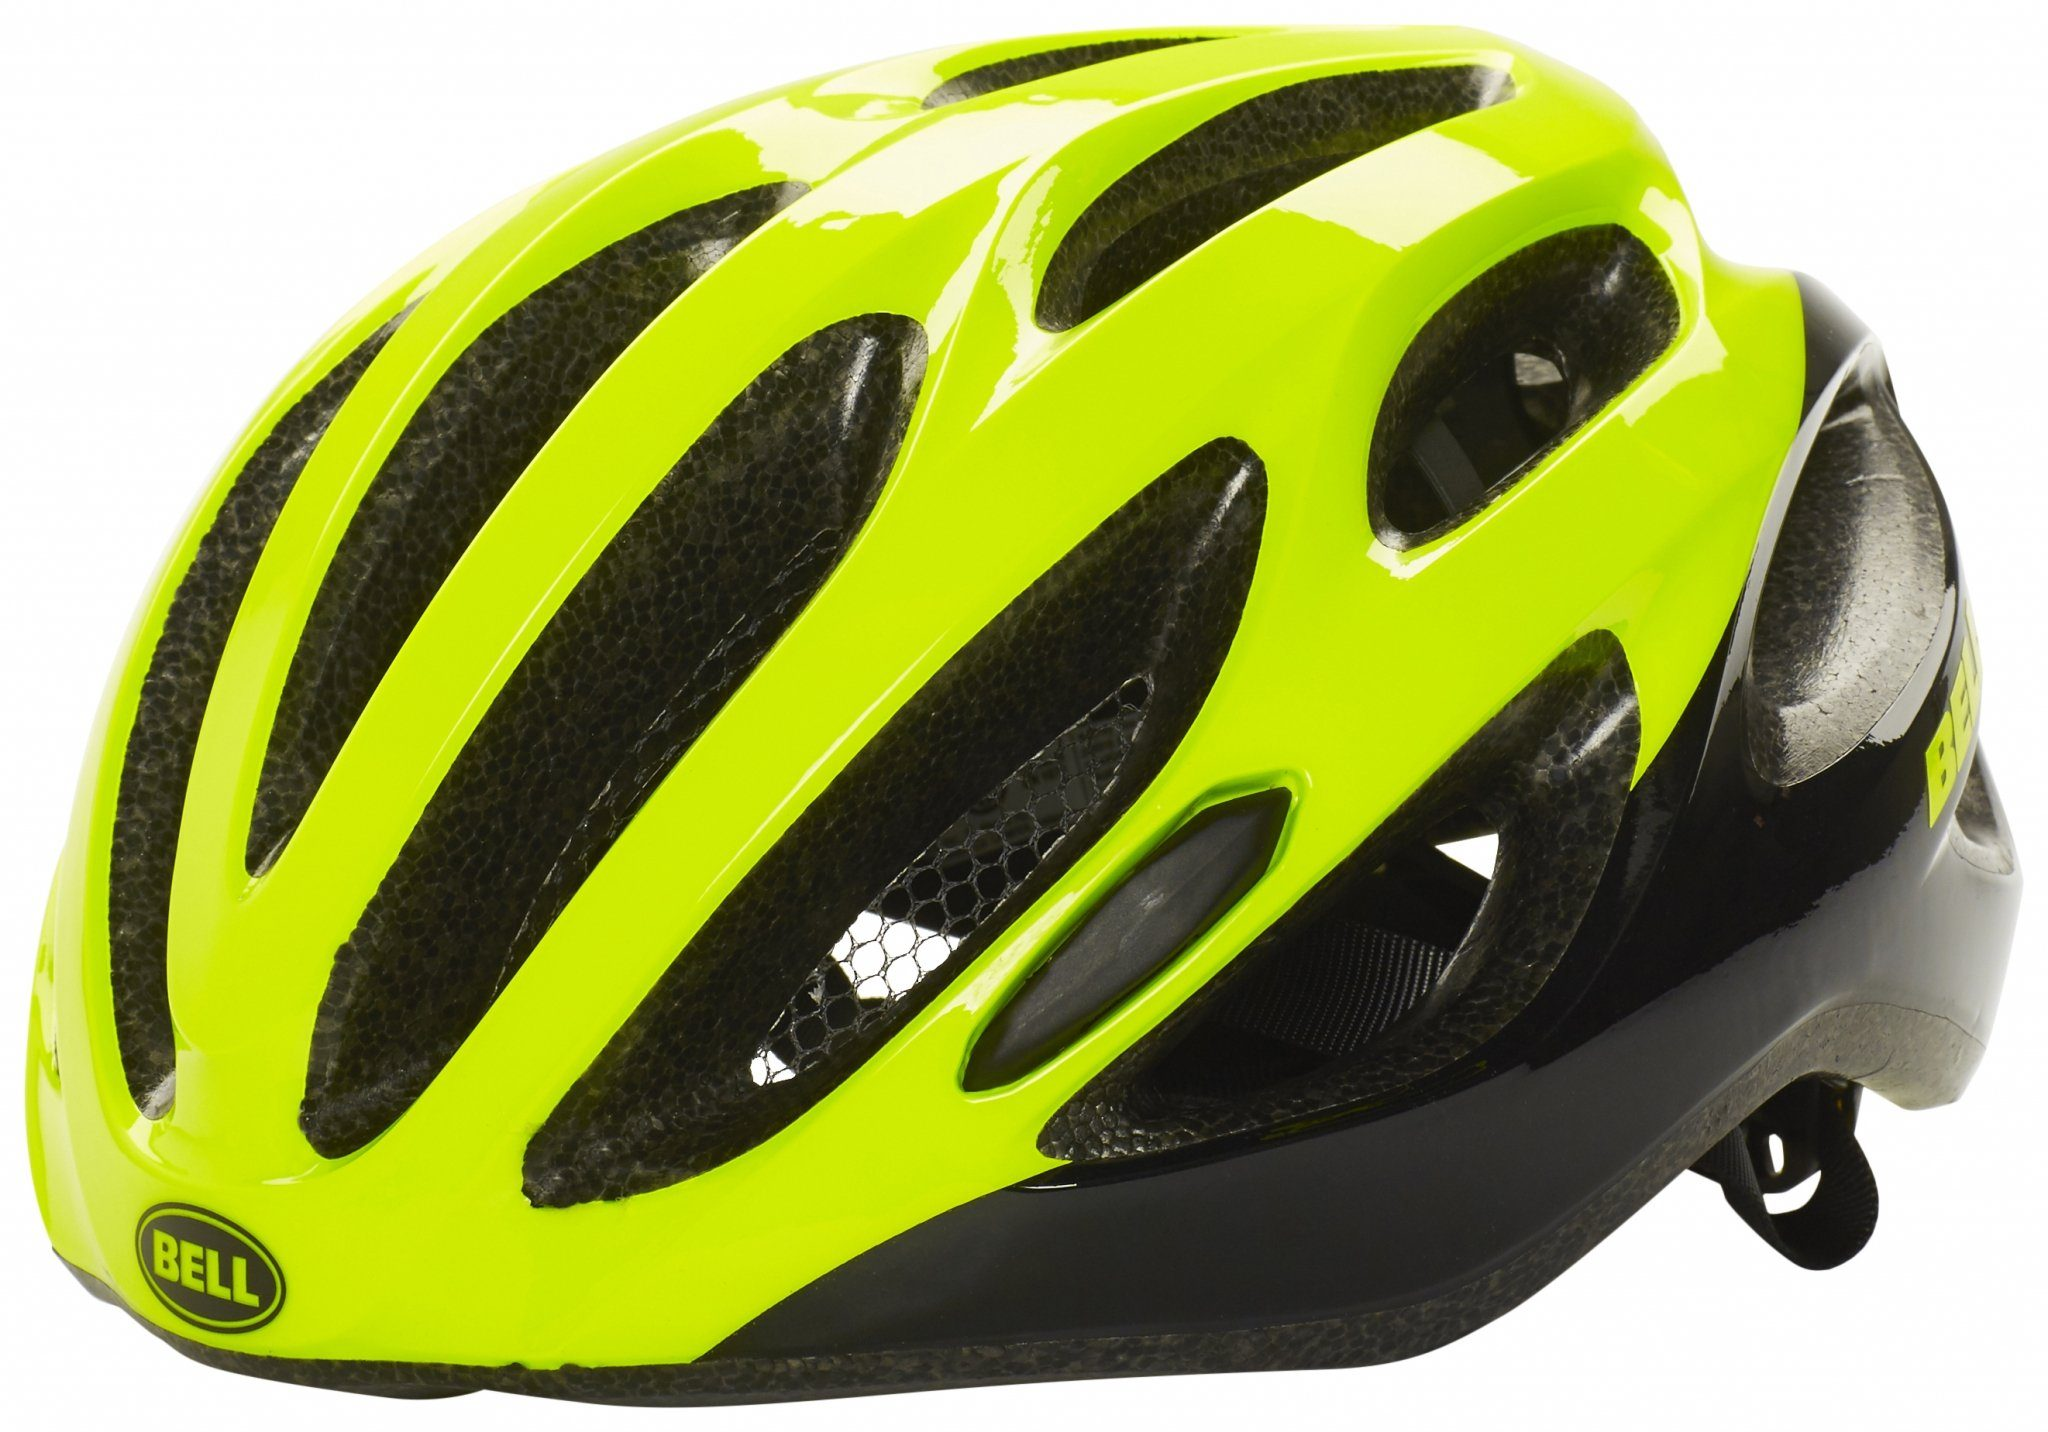 Bell Fahrradhelm »Draft Helmet unisize«